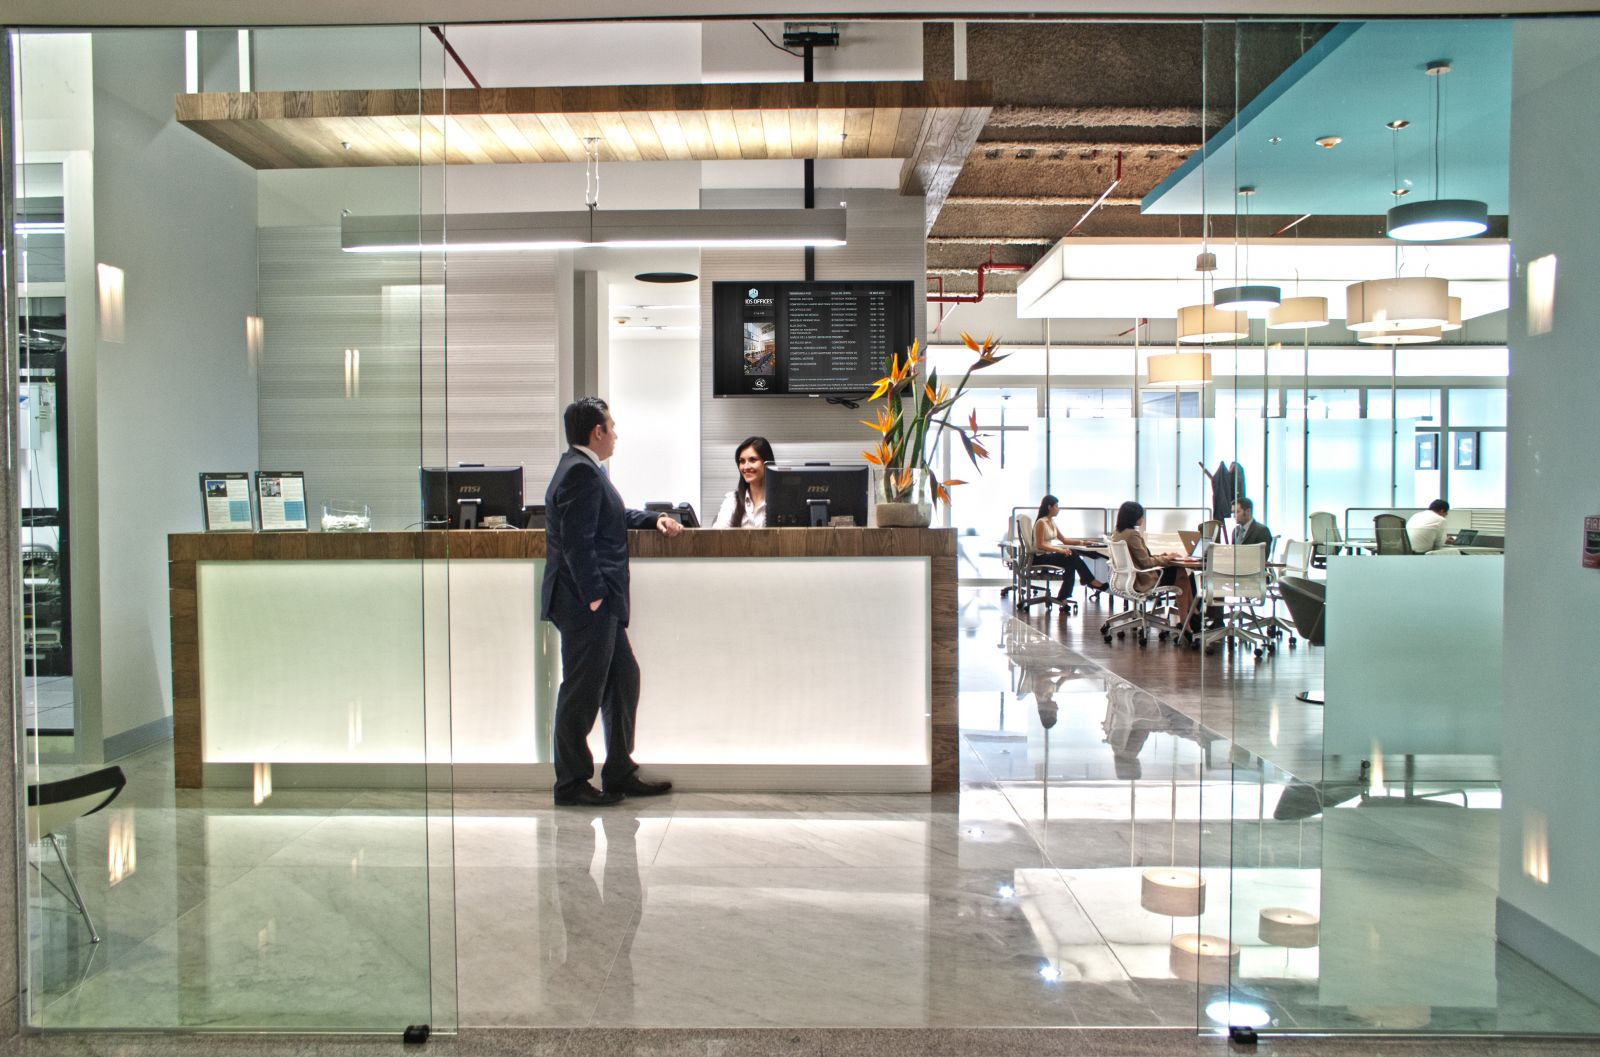 IOS OFFICES CORPORATIVO CEO, Mexico City